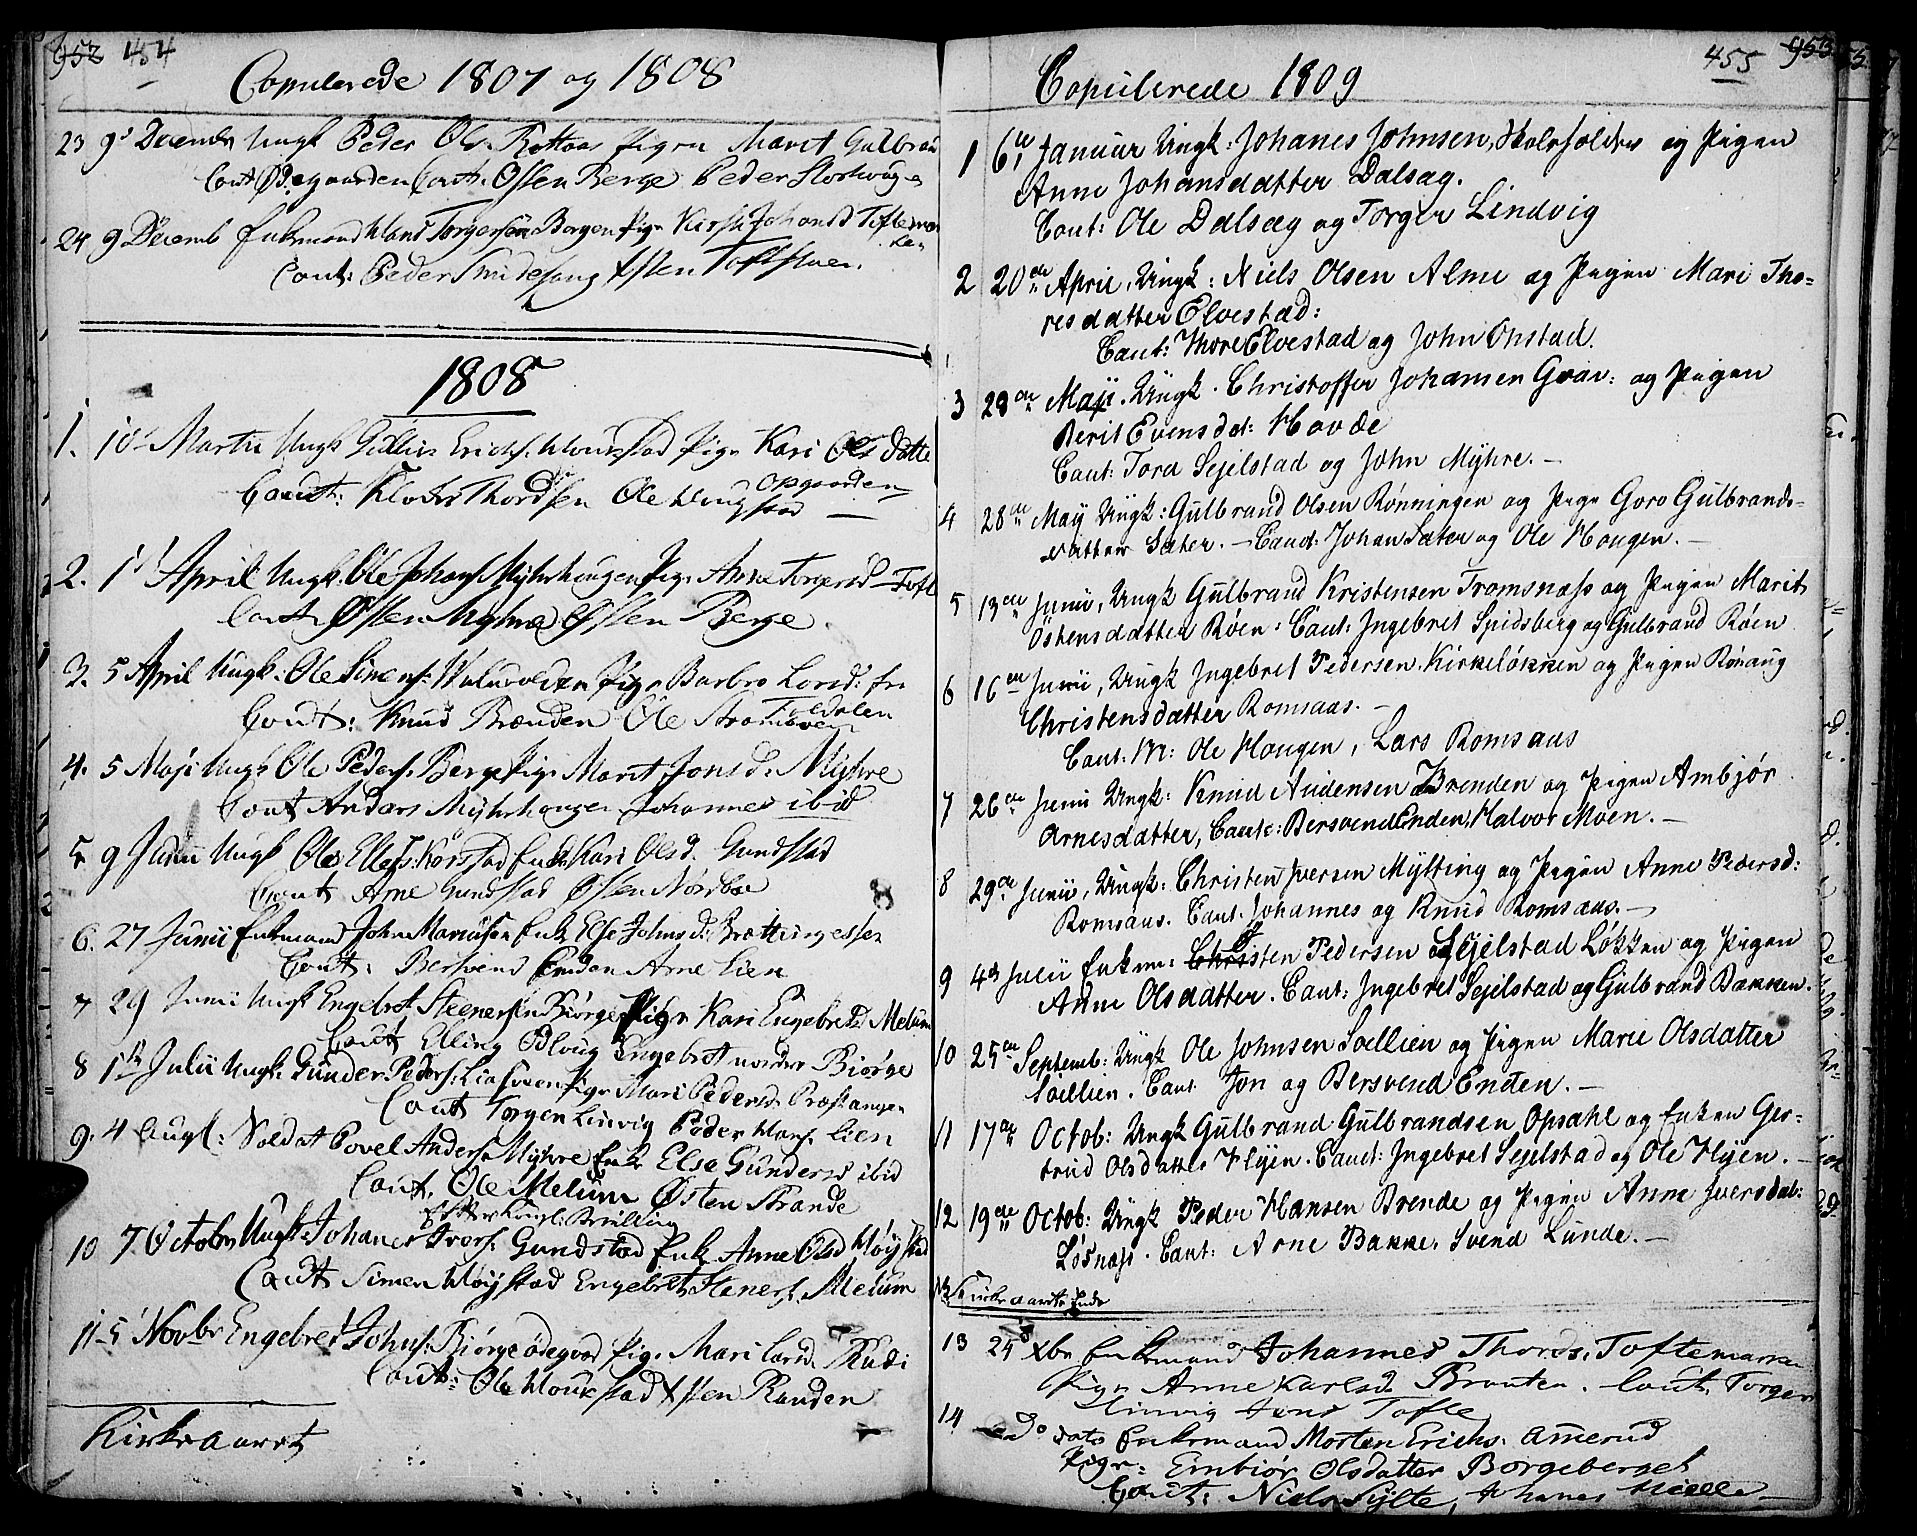 SAH, Ringebu prestekontor, Ministerialbok nr. 3, 1781-1820, s. 454-455